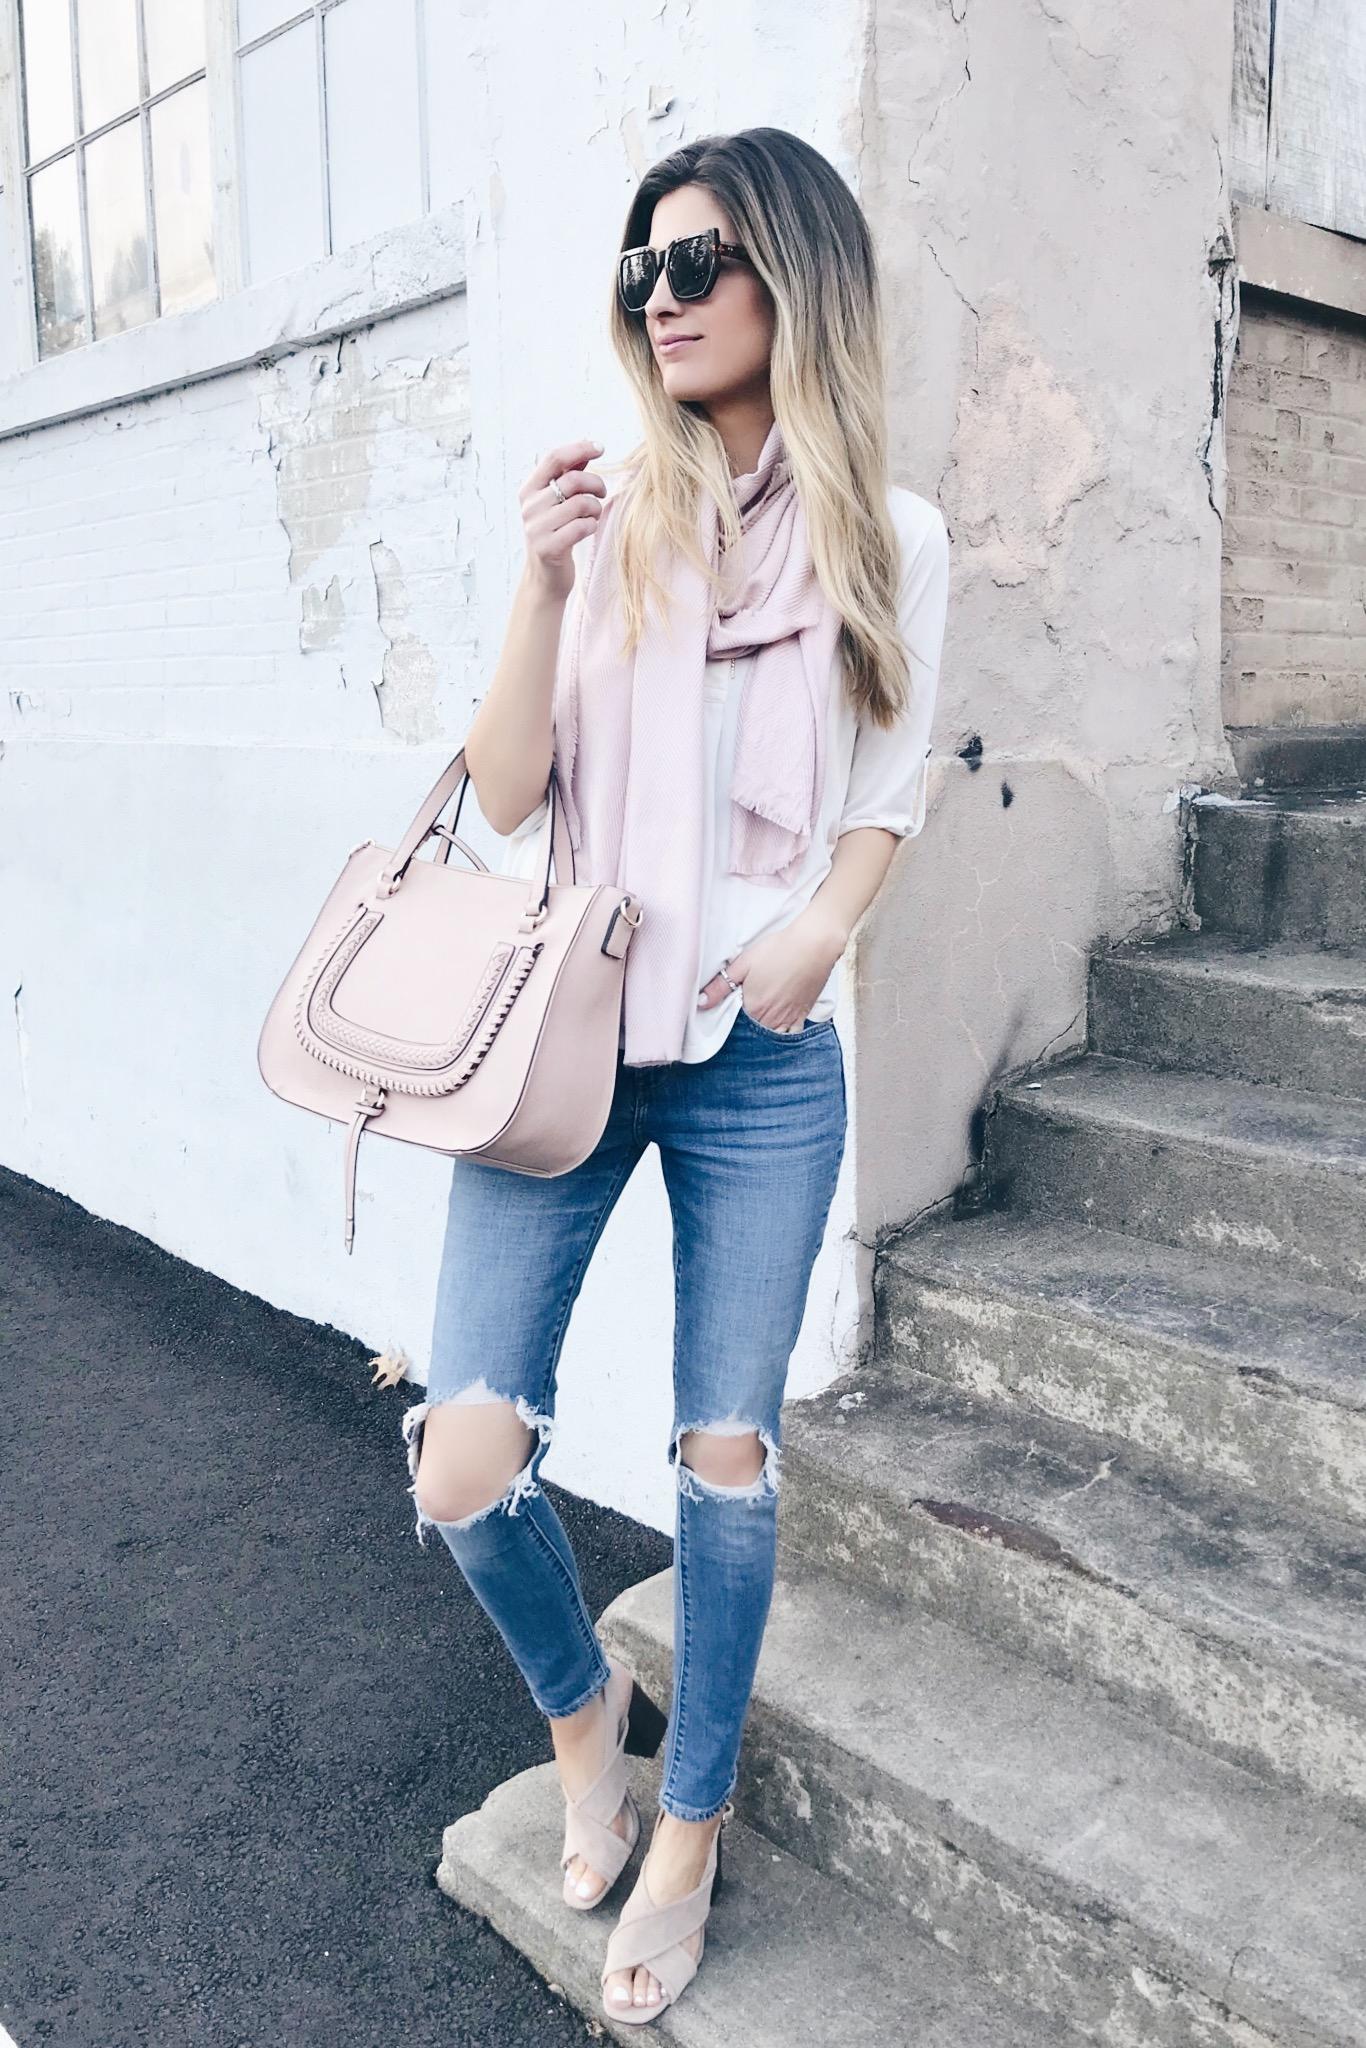 Spring Handbags 2019 - Sole Society Blush Destin Satchel on Pinteresting Plans fashion blog